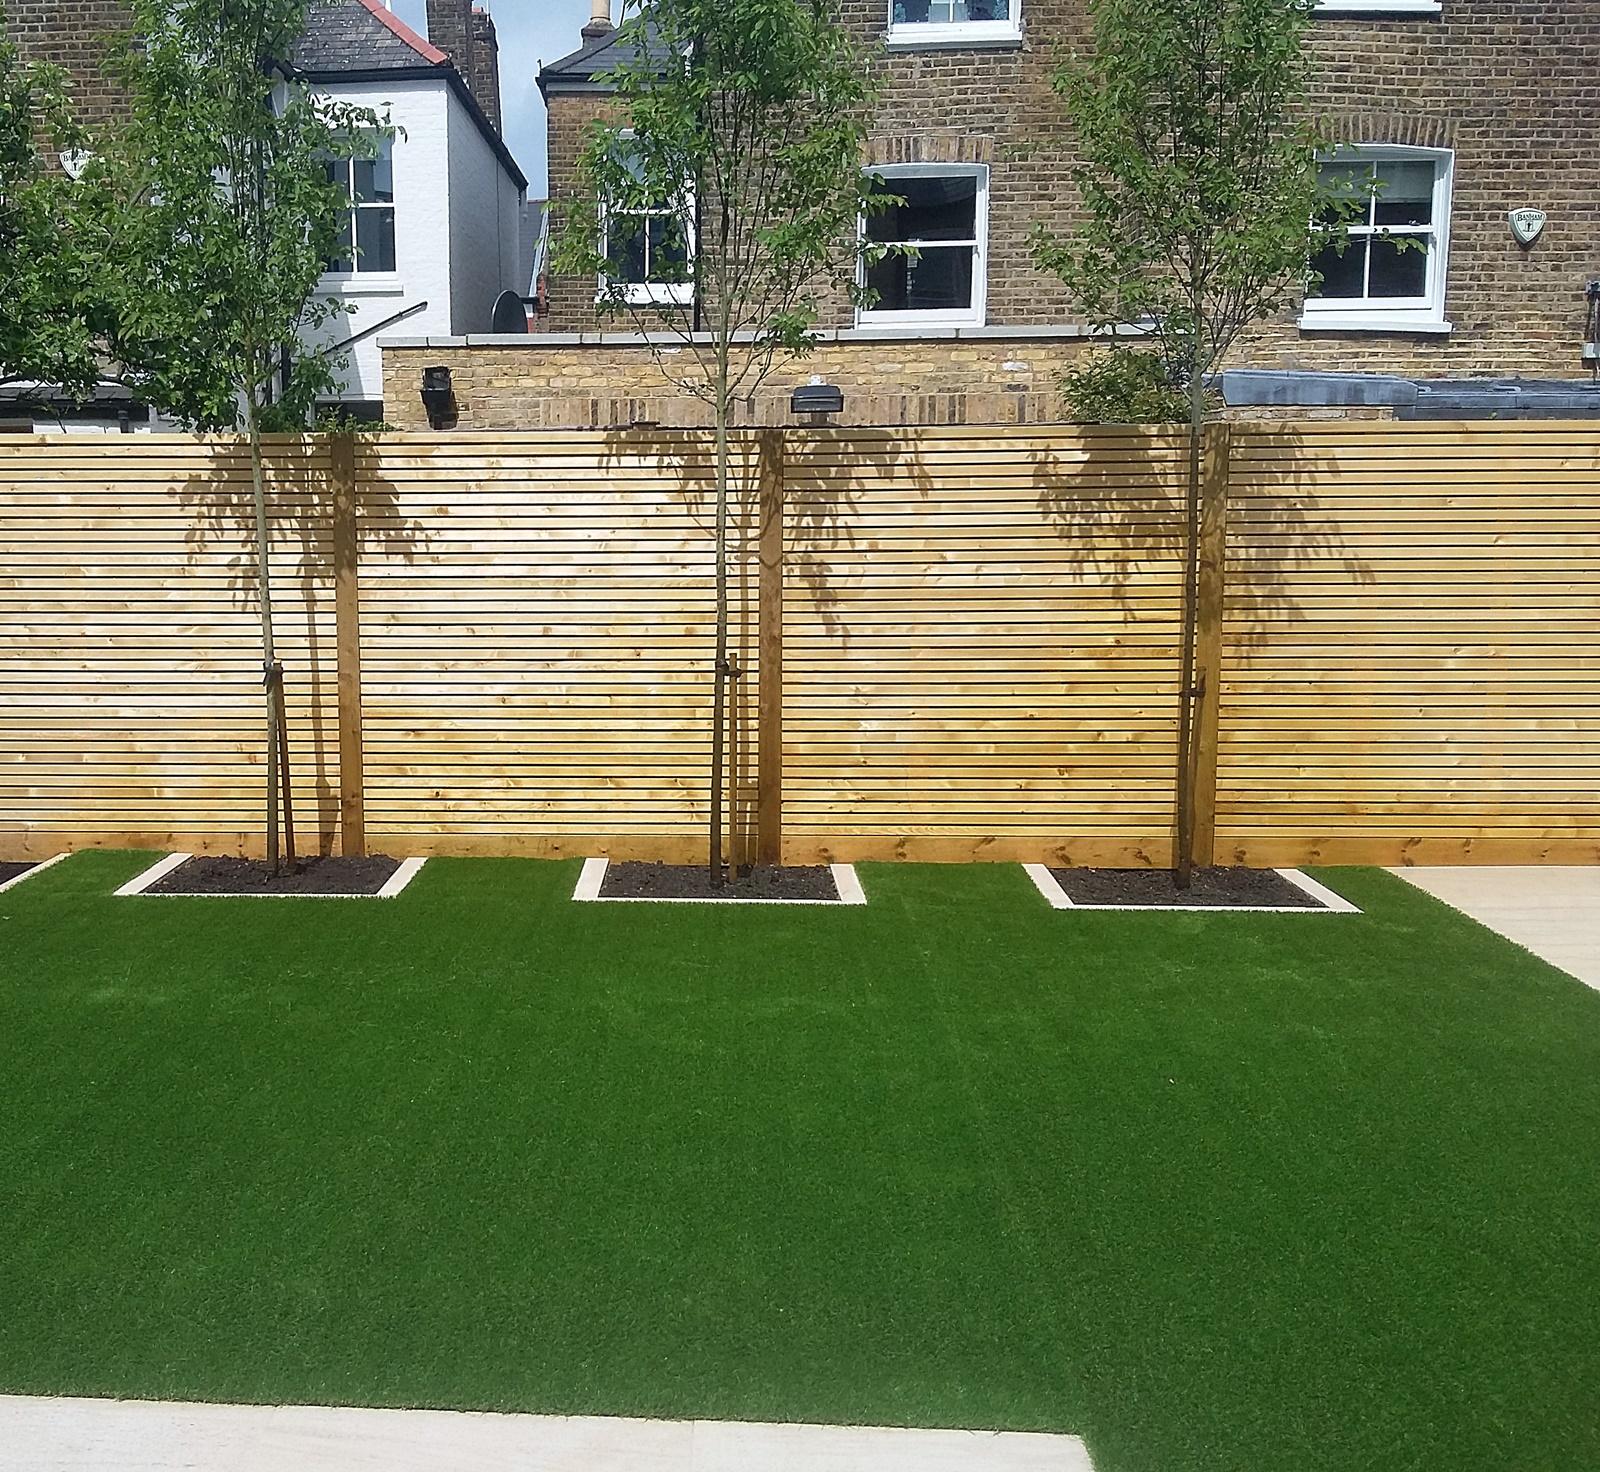 Grass archives london garden blog for Backyard privacy screens trellis